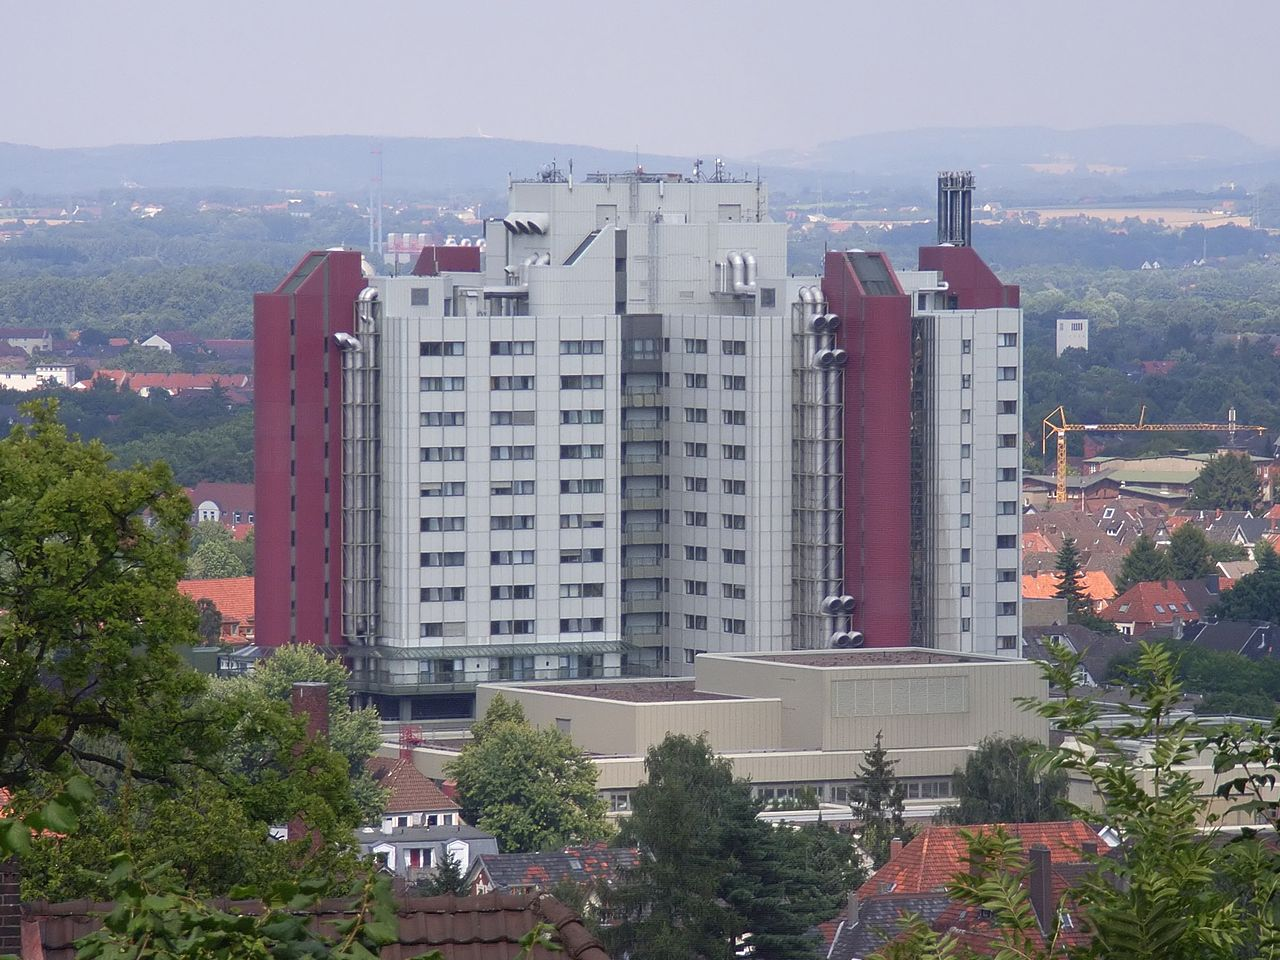 Bild Krankenhausmuseum Bielefeld